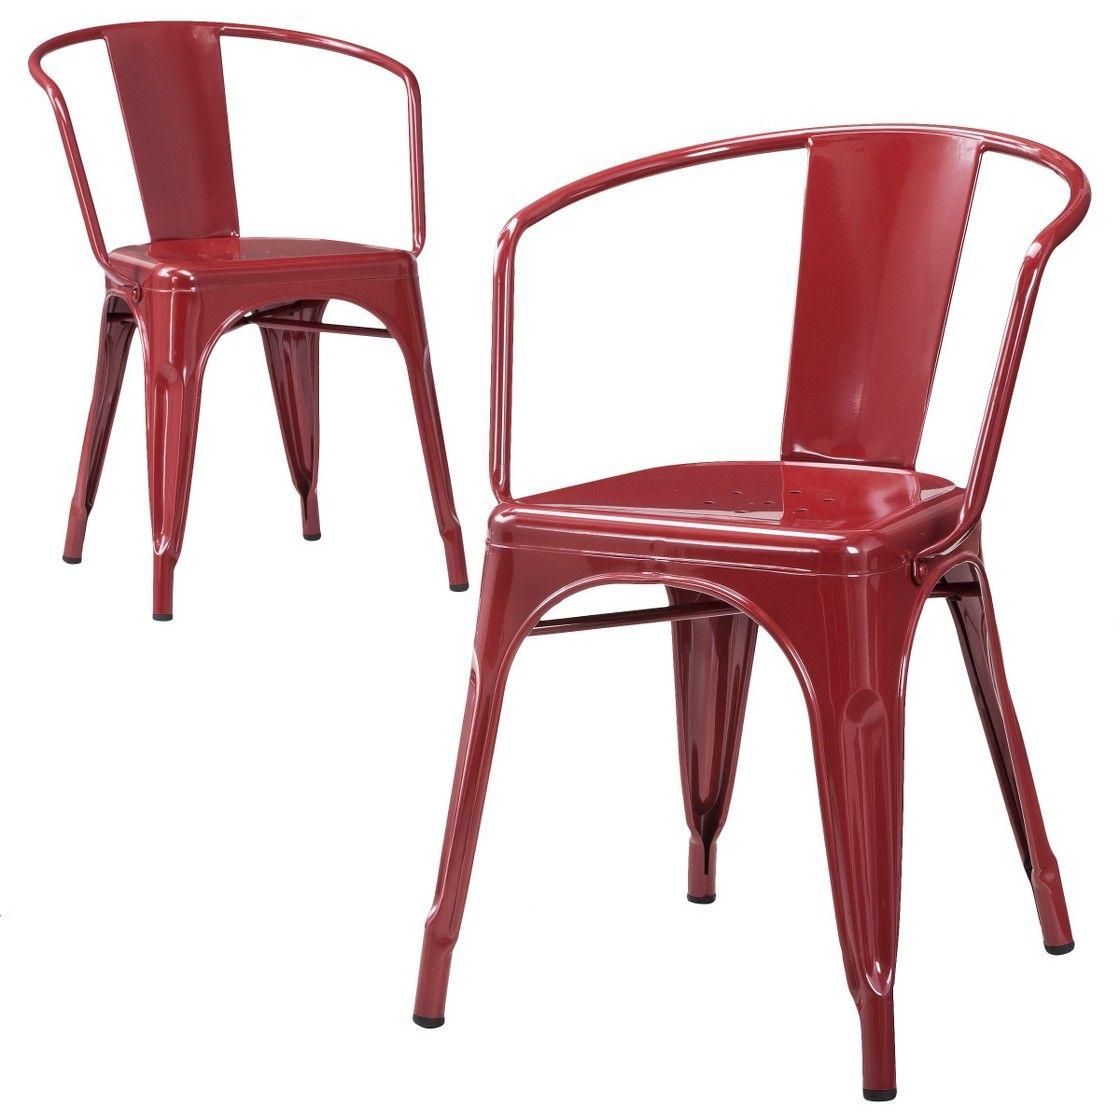 Carlisle Metal Dining Chair Threshold Metal Dining Chairs Brown Dining Chairs Colored Dining Chairs